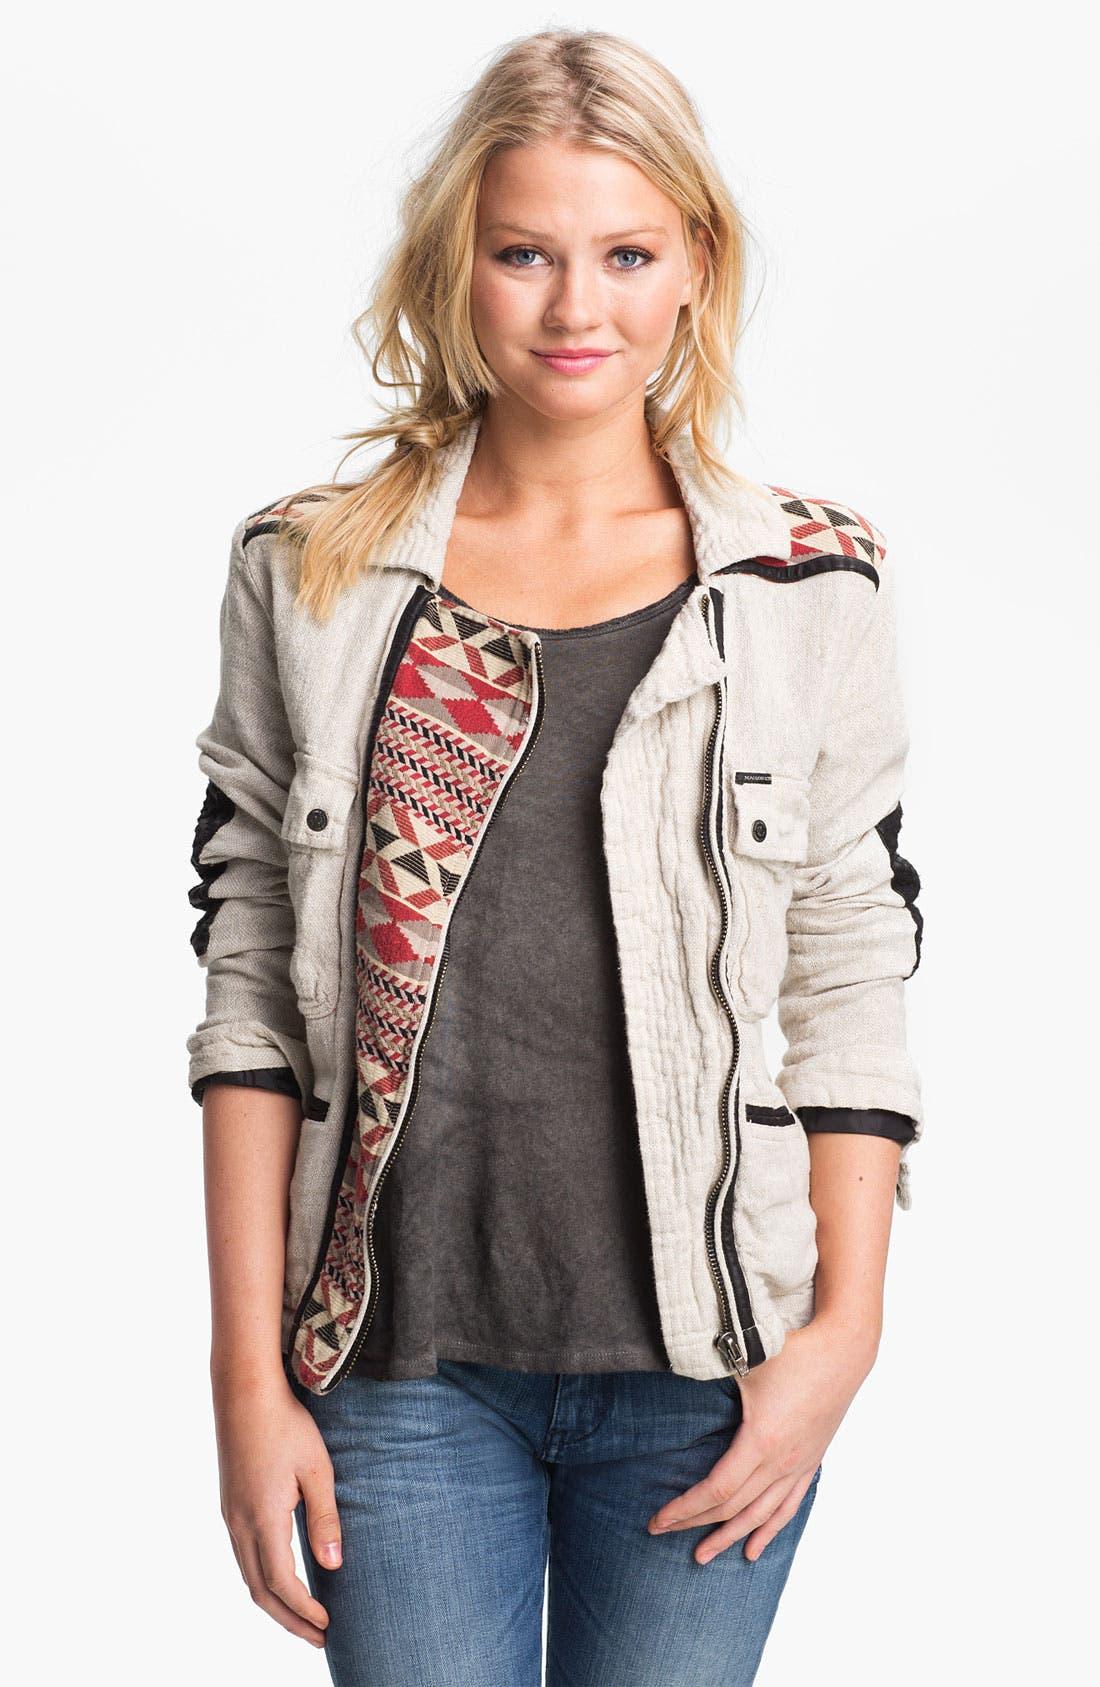 Main Image - Maison Scotch Faux Leather & Ikat Trim Field Jacket